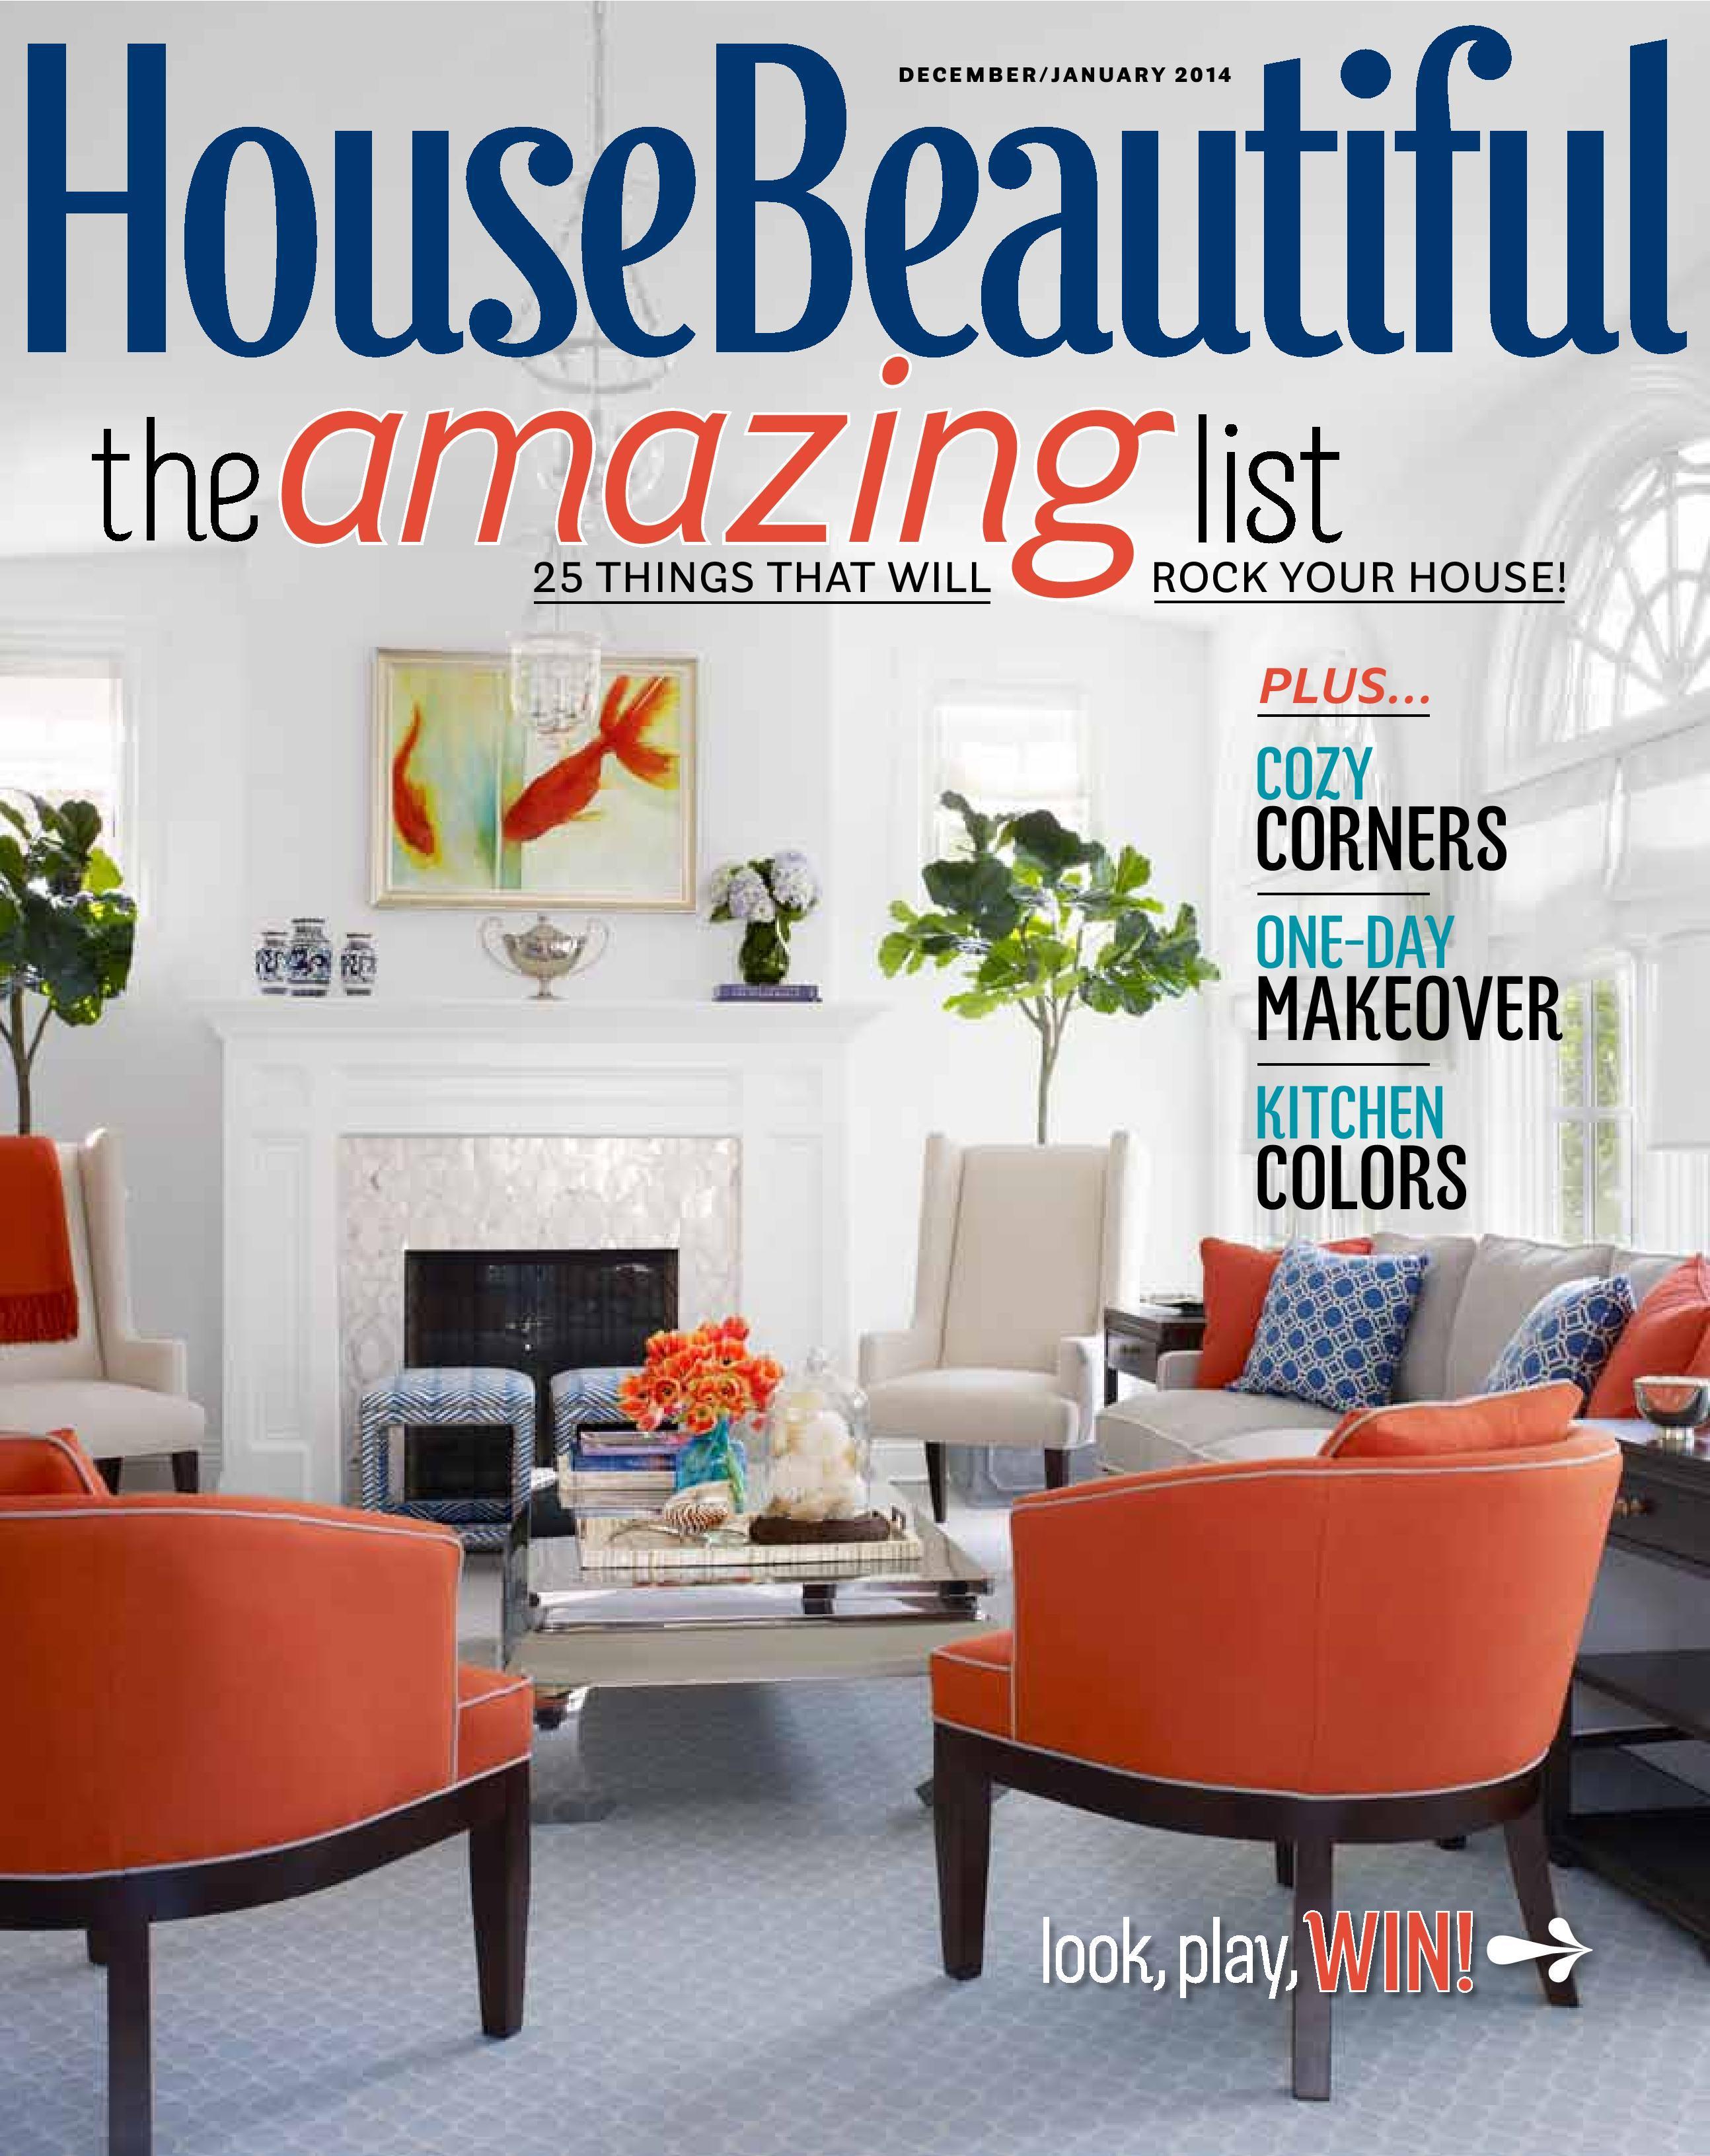 House Beautiful Dec